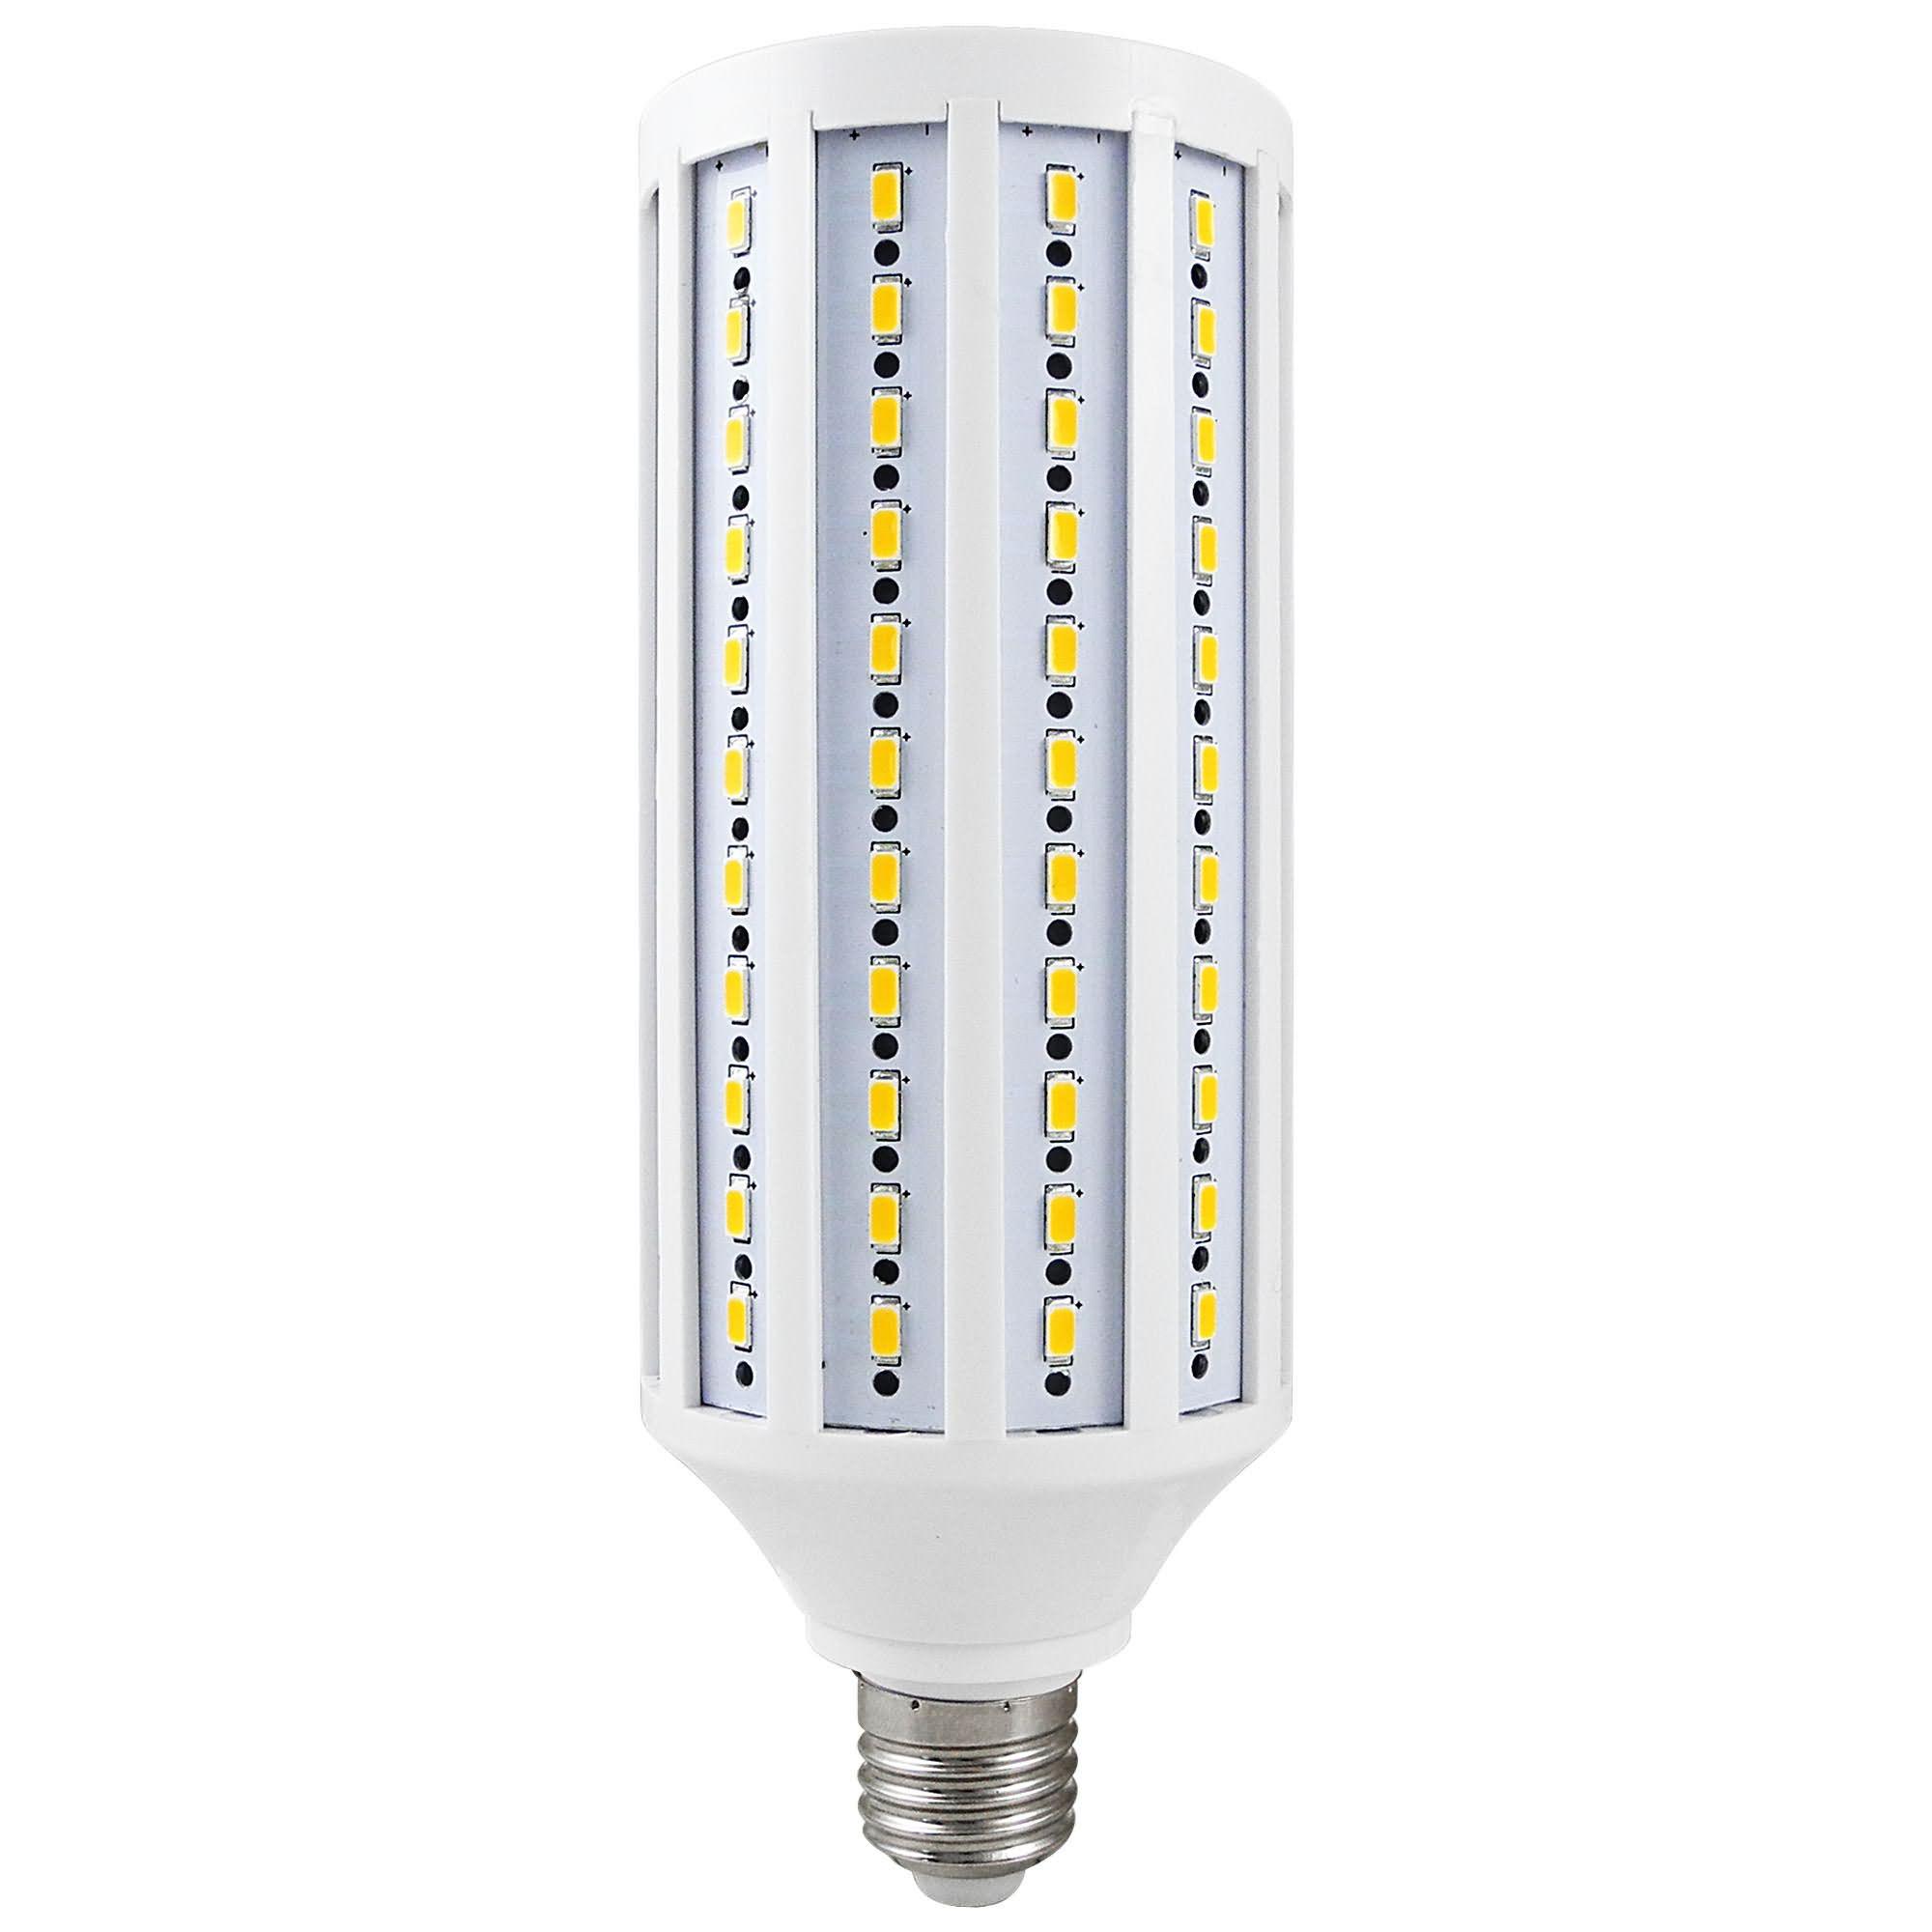 e27 30w led corn light 165x 5730 smd leds led bulb in warm white energy saving lamp led lights. Black Bedroom Furniture Sets. Home Design Ideas